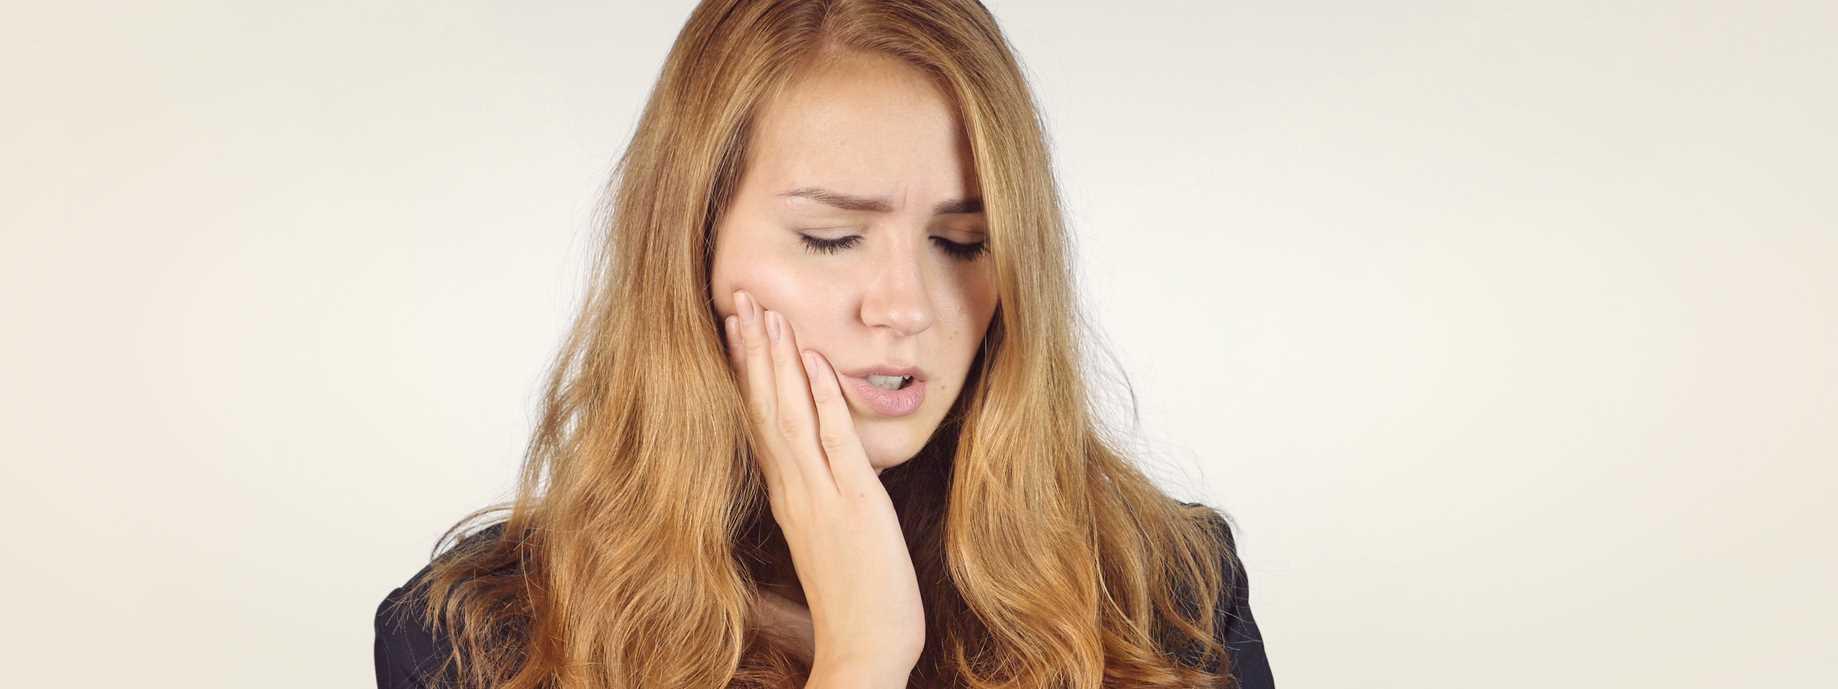 TMJ Treatment To Prevent Jaw Pain Springfield Missouri